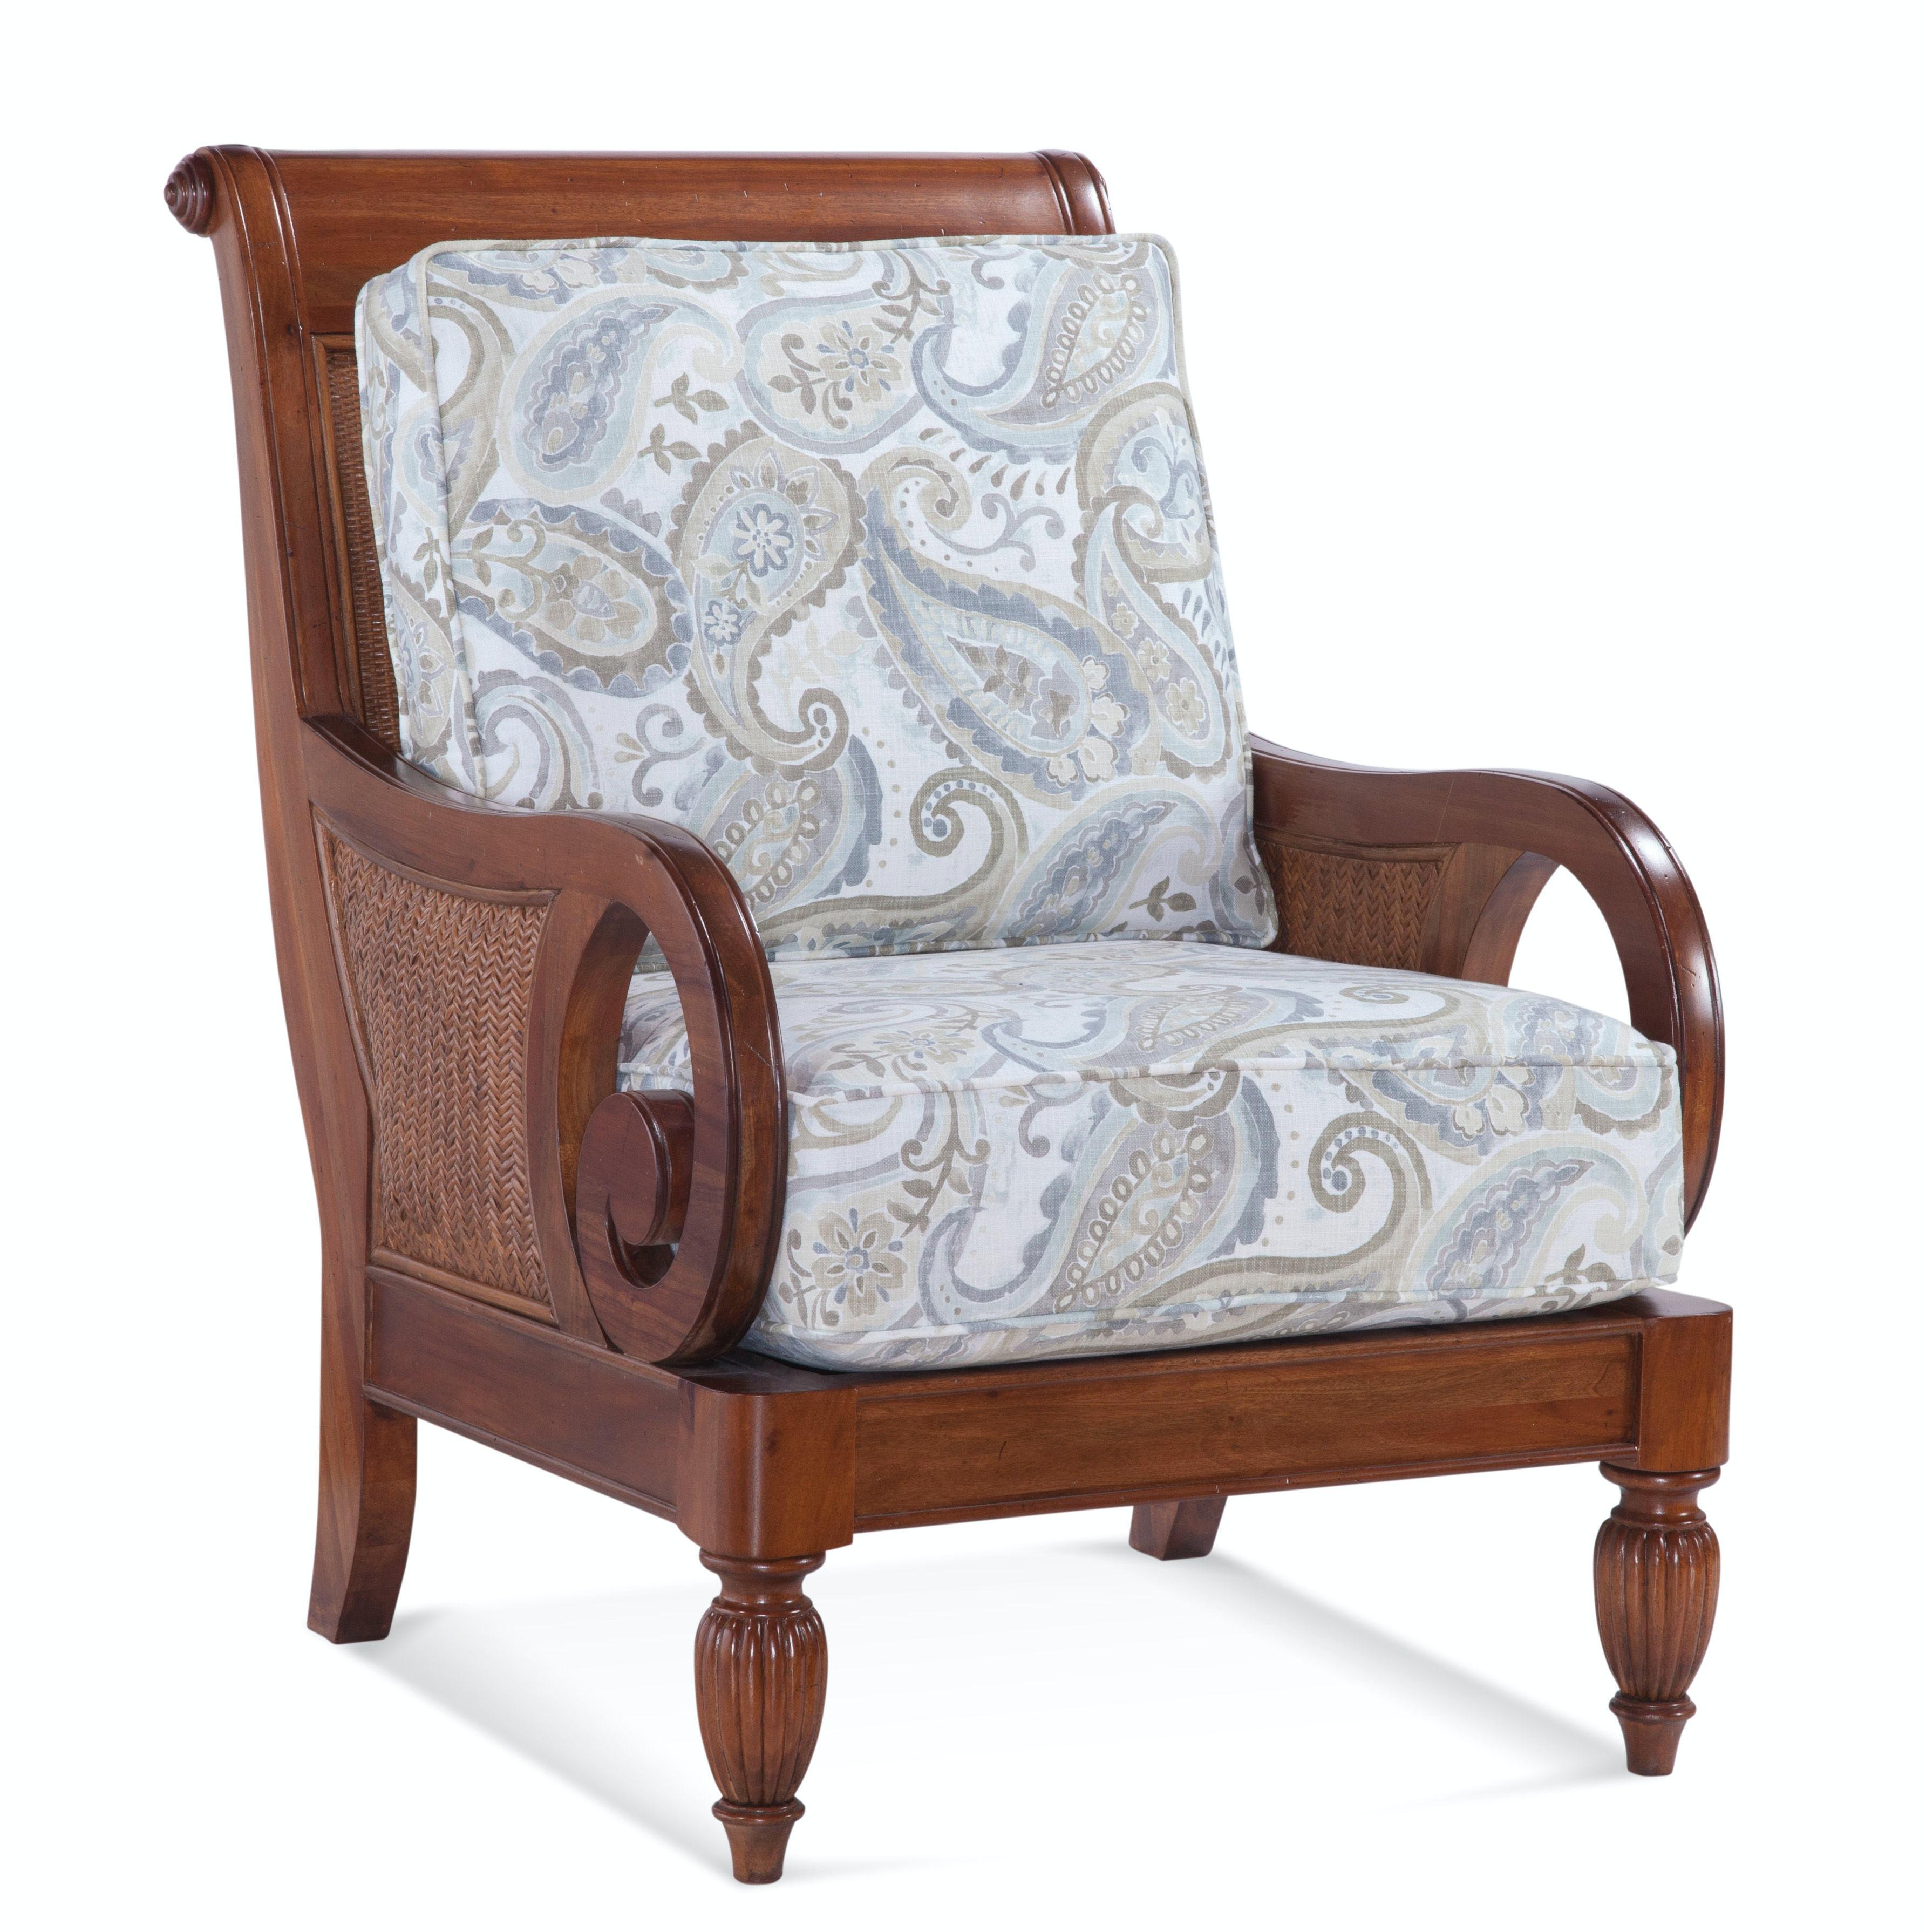 Grand View Chair 934-001